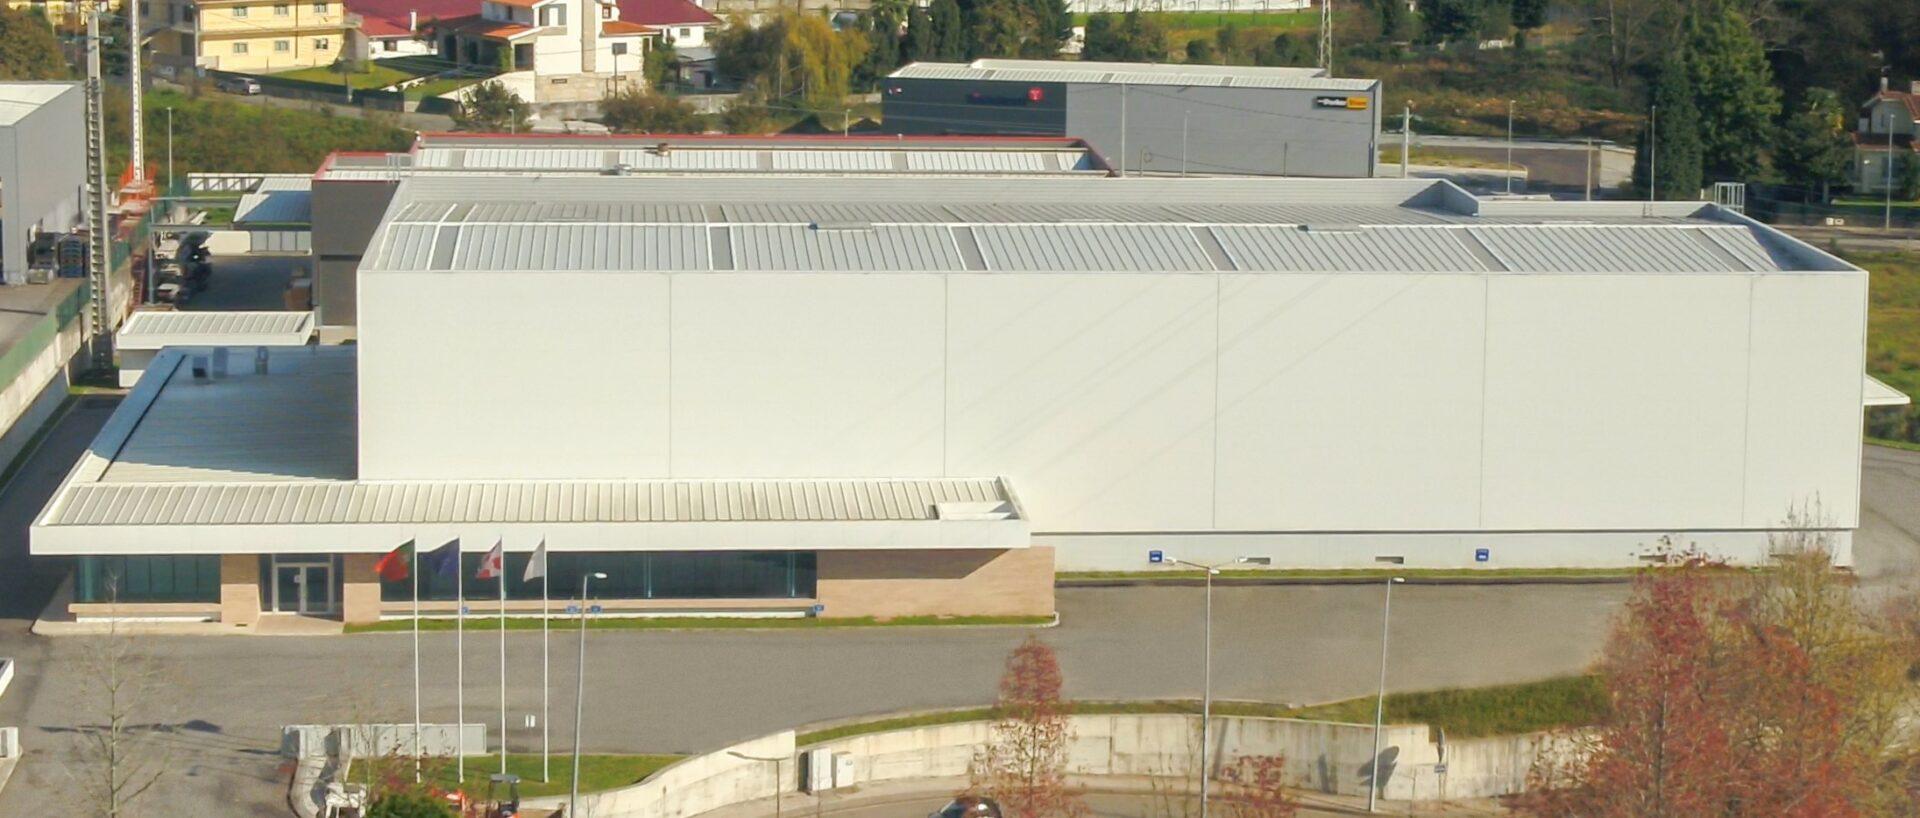 Milling Centre